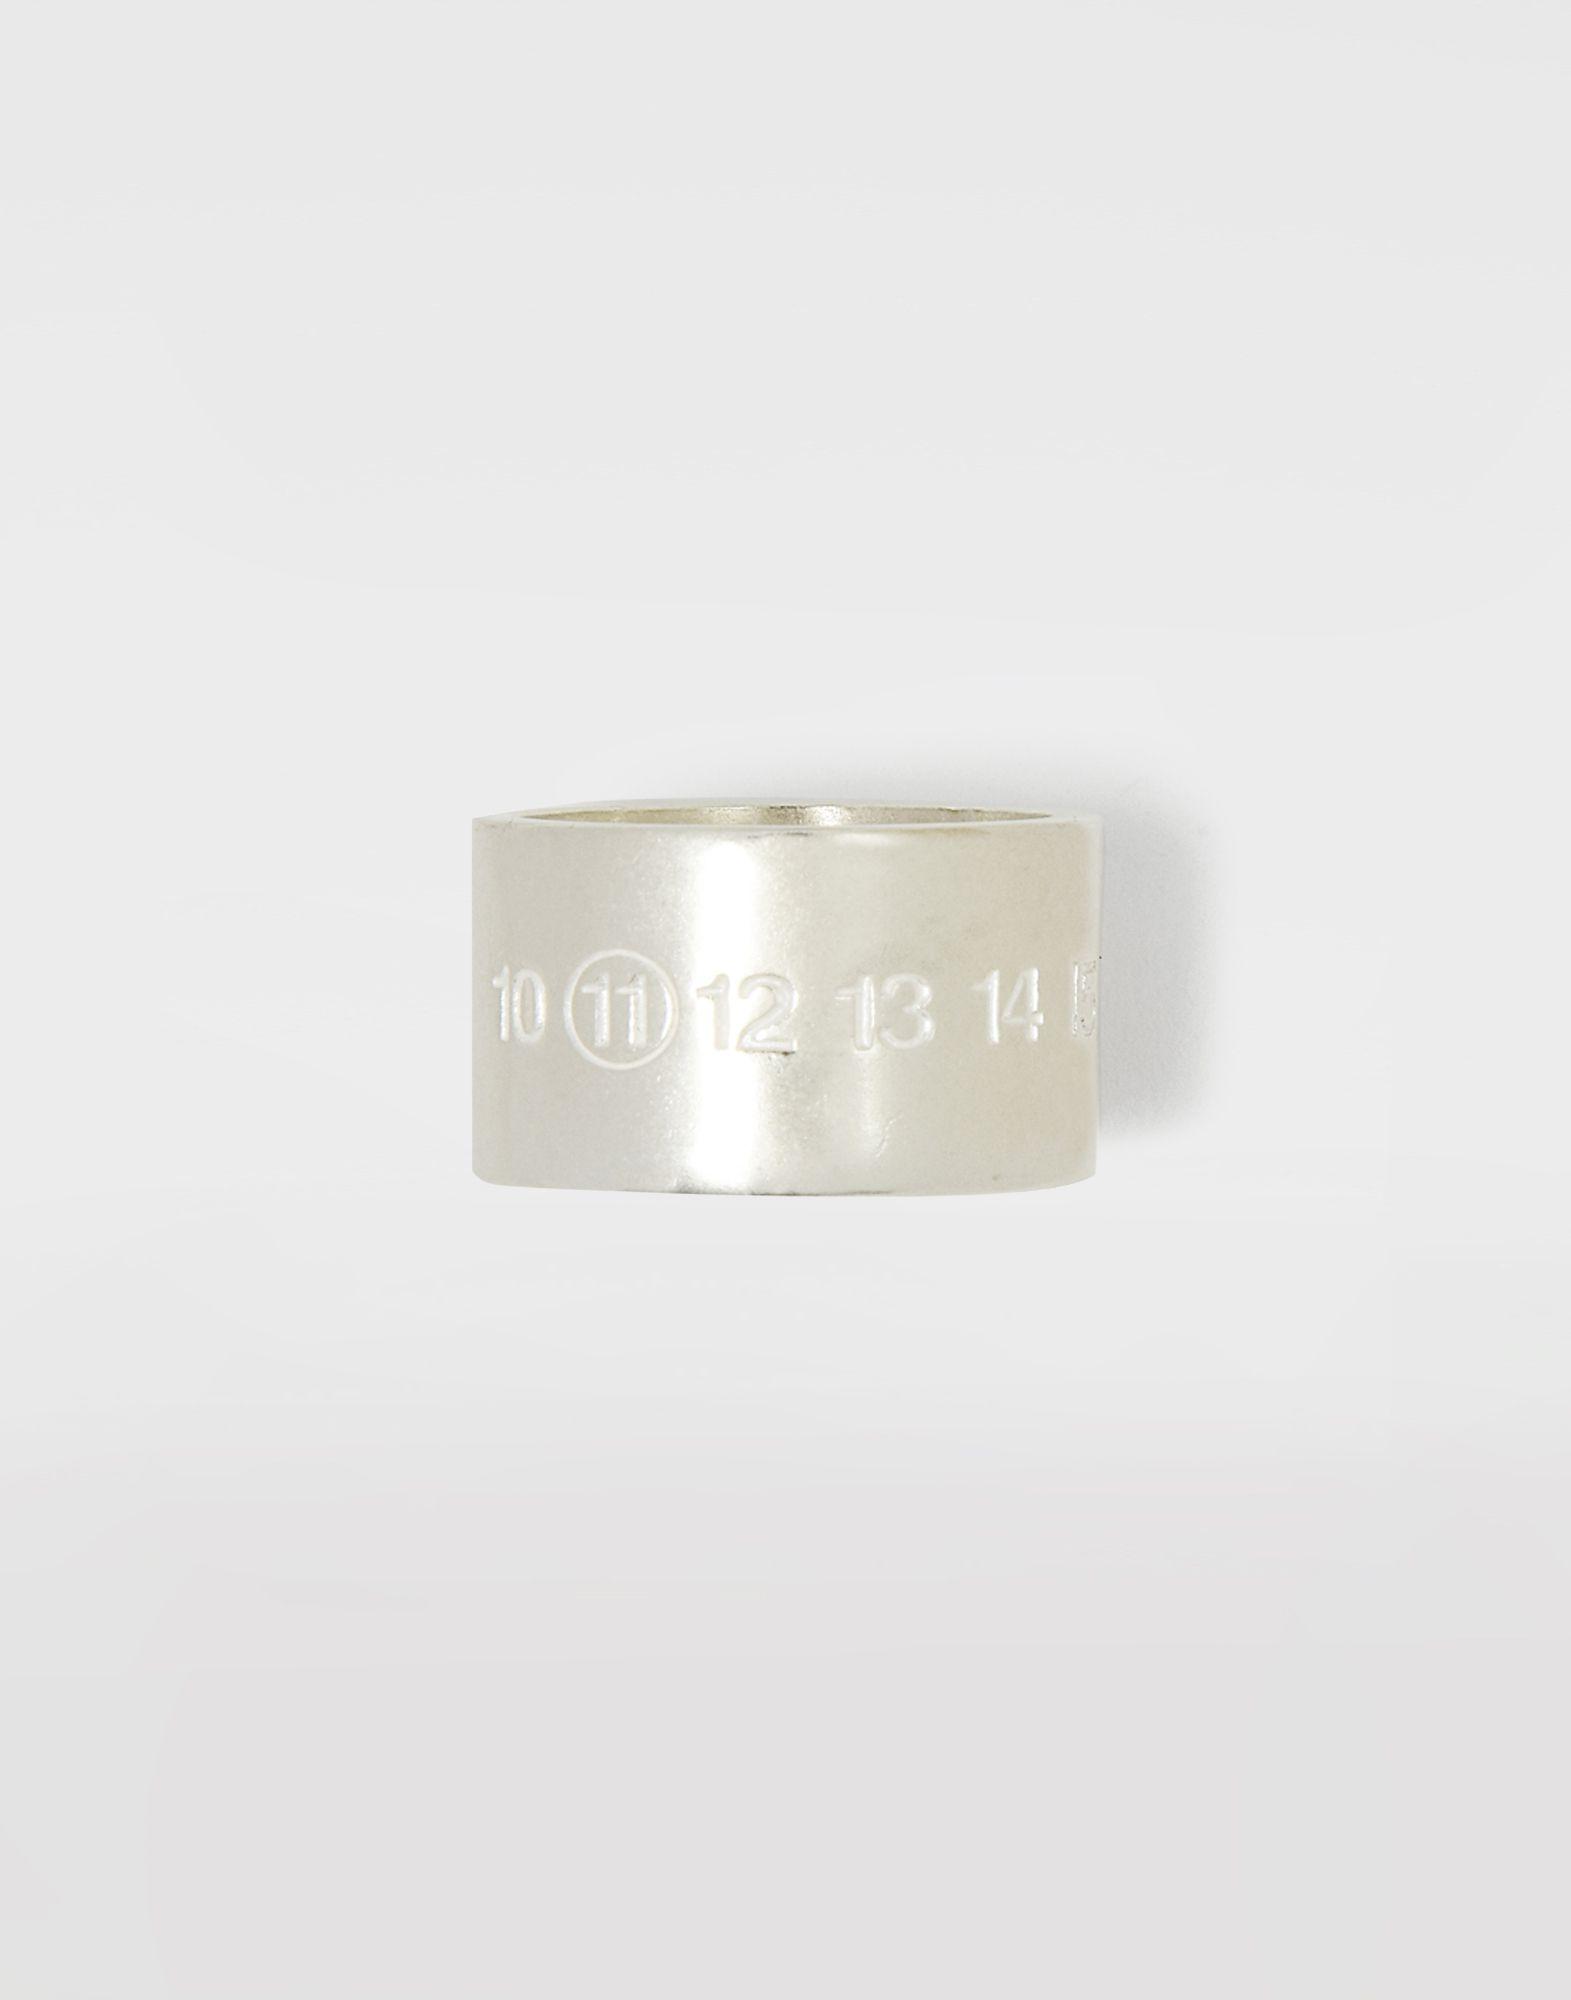 MAISON MARGIELA Manschettenring mit Logo, Silber Ring Herr f